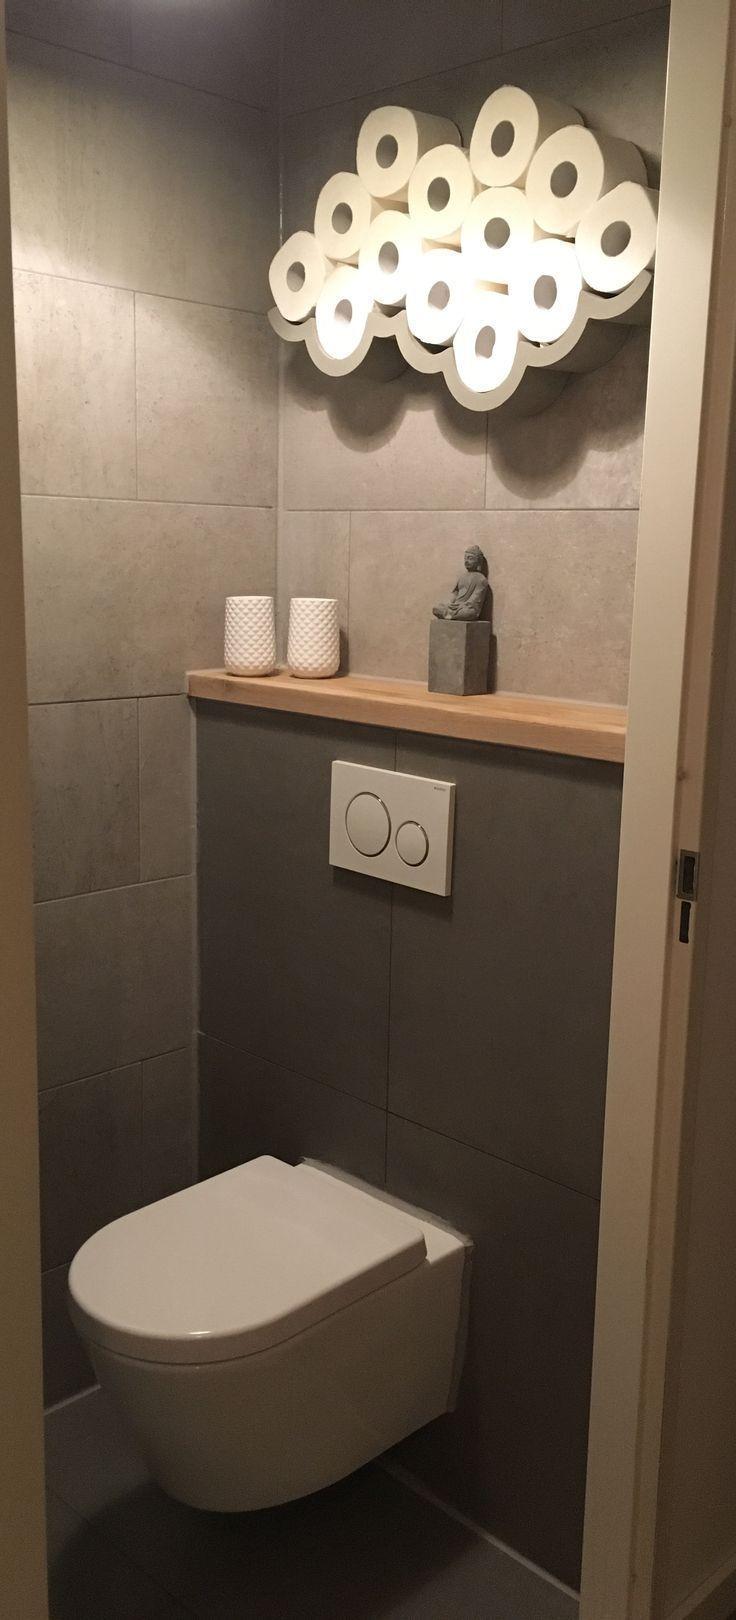 Bathroom Makeovers 20 Great Before After Transformations For Every Budget Badezimmer Umbau Badezimmer Fliesen Ideen Badezimmerideen